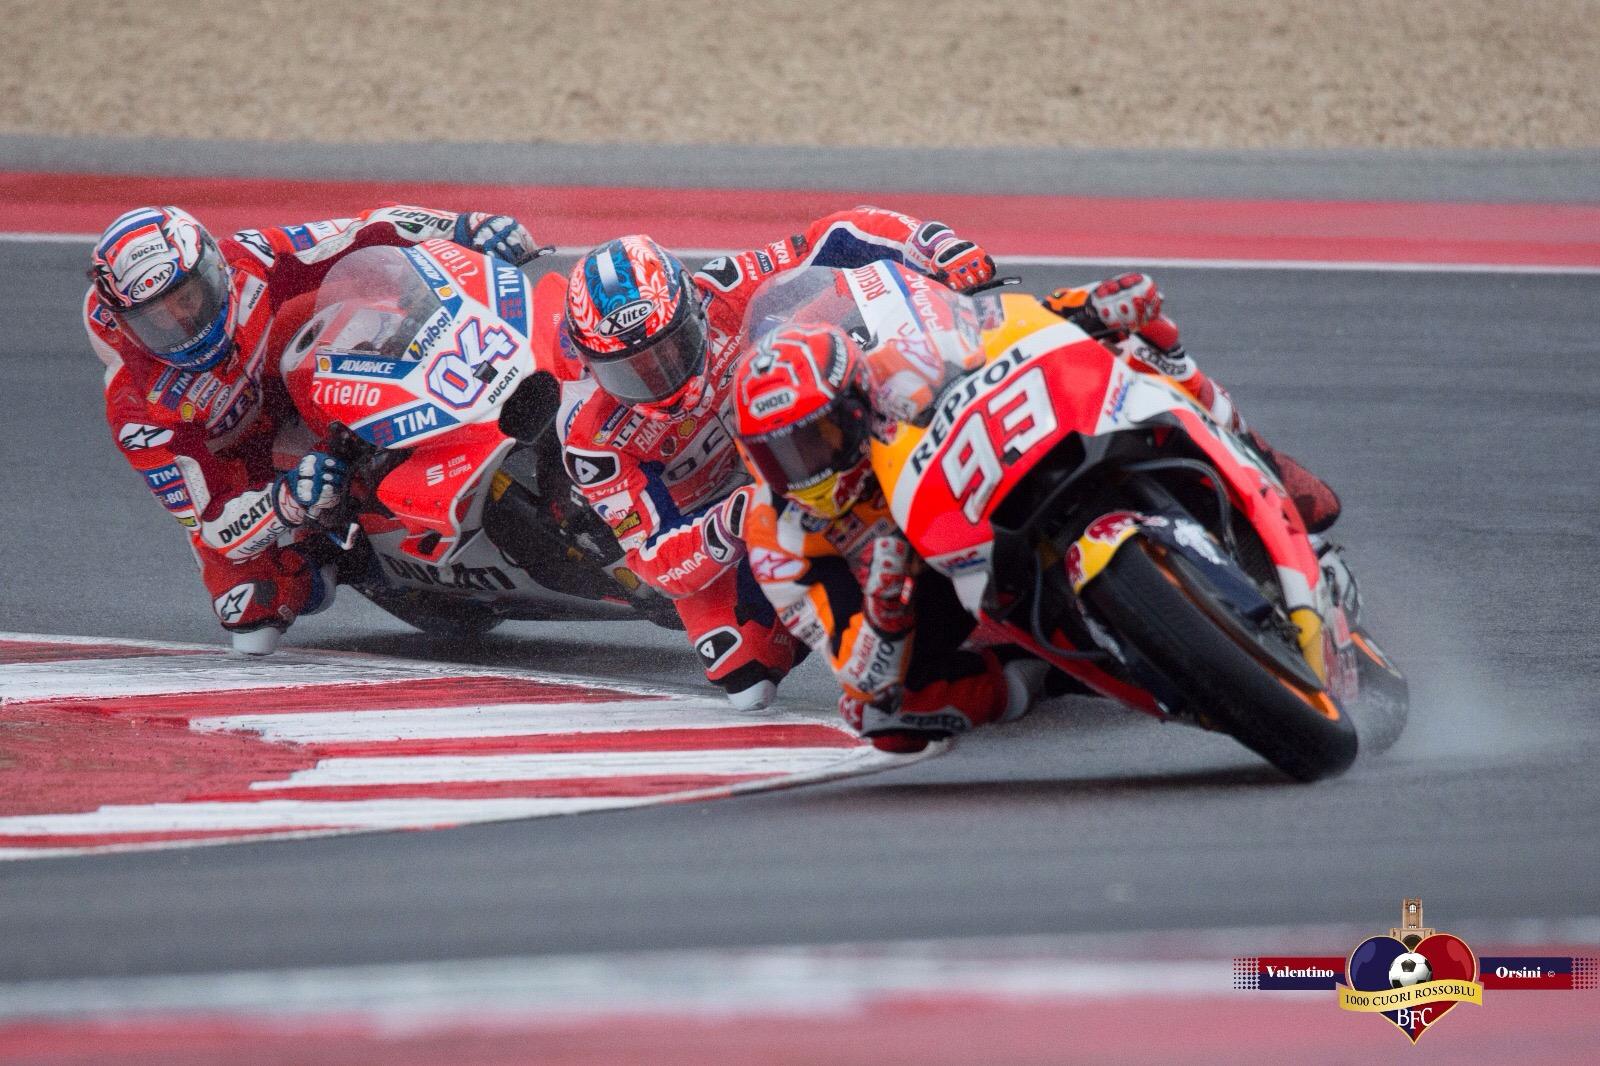 MotoGP - Misano - Marquez rovina la festa Ducati - 11 set